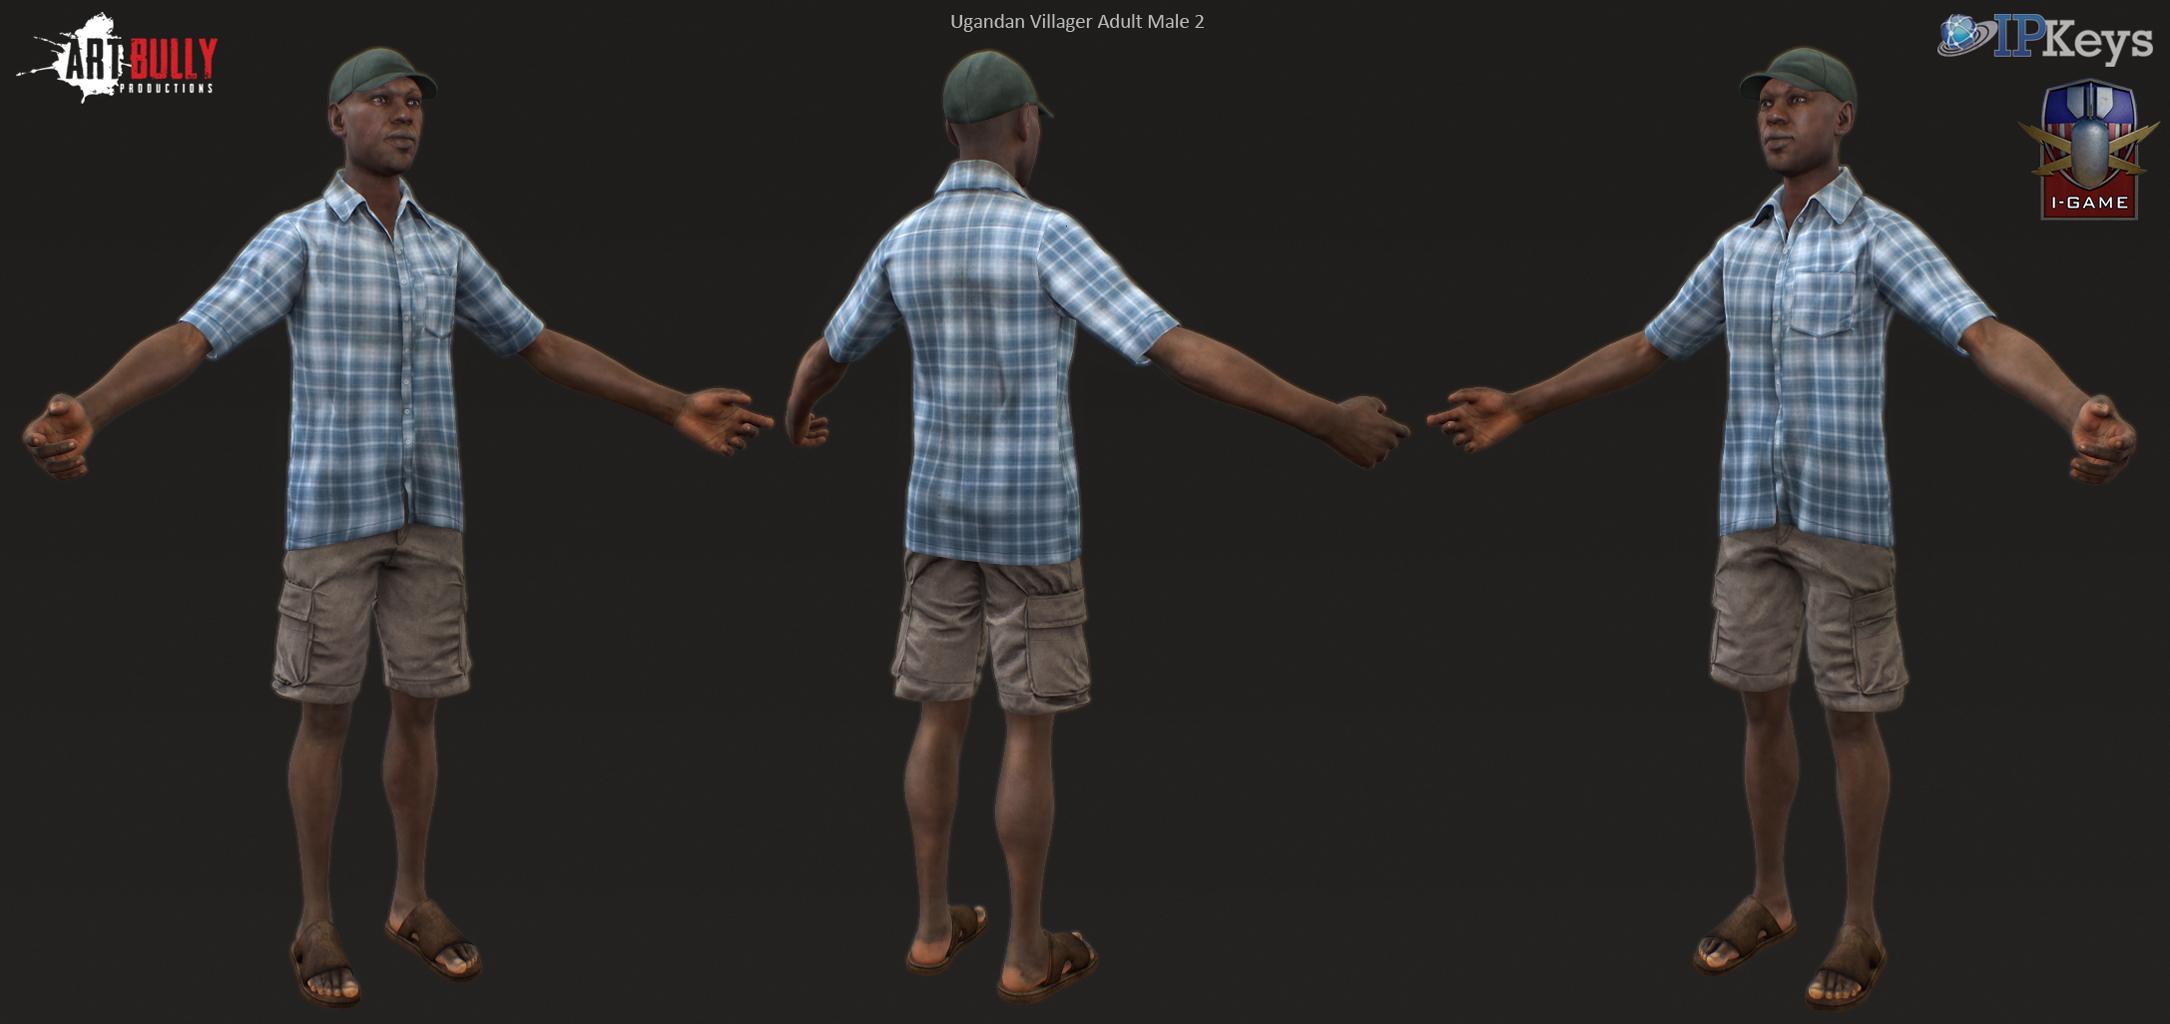 Ugandan_Villager_Adult_Male2.jpg